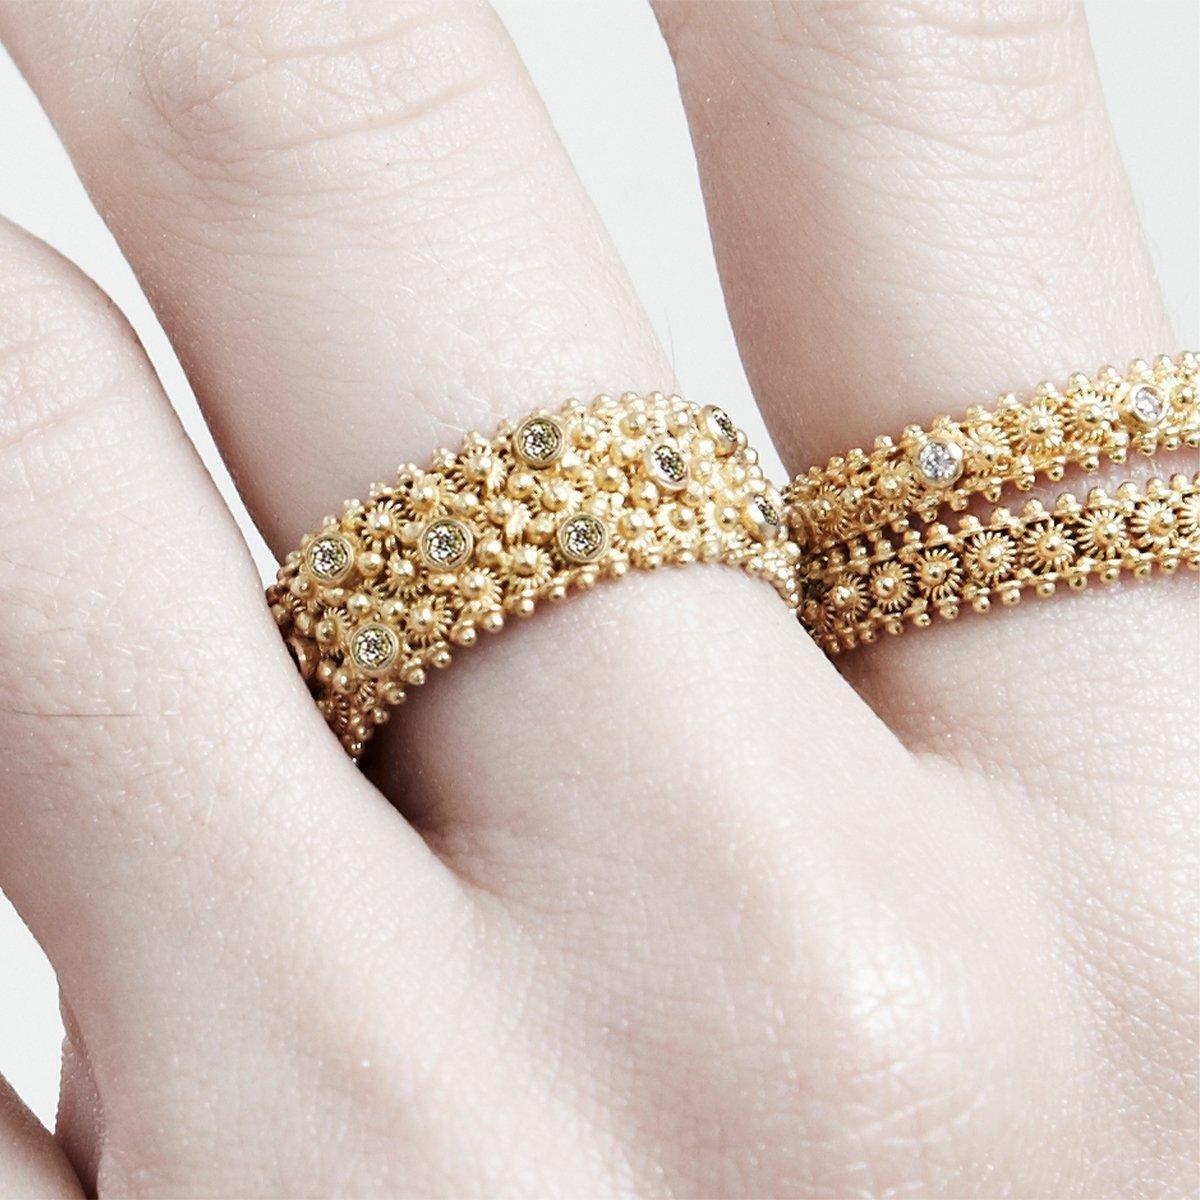 Shop Diamond Rings